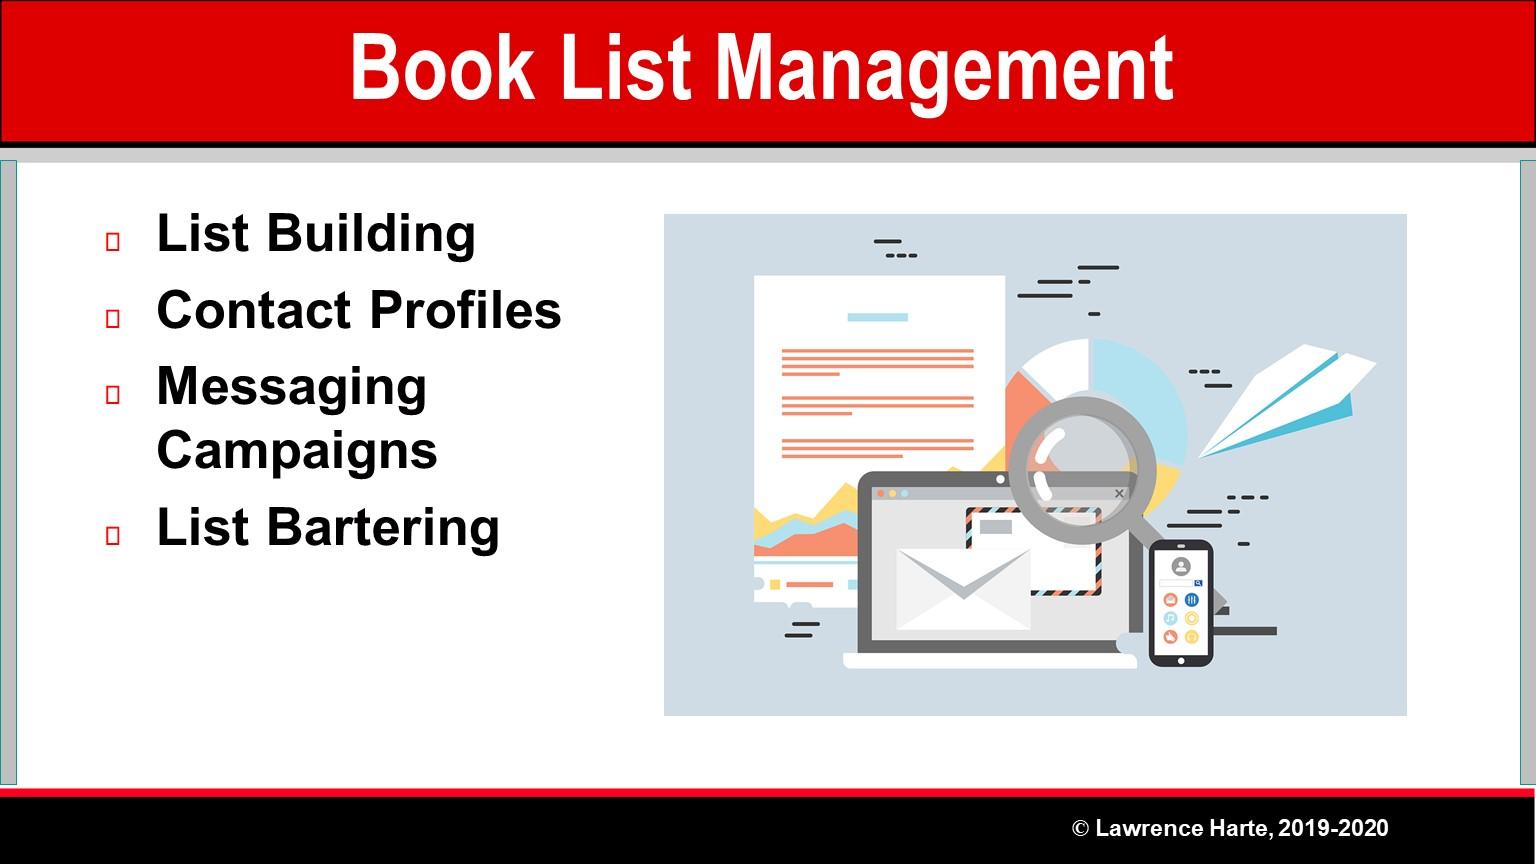 Book Pre-Launch Marketing List Management